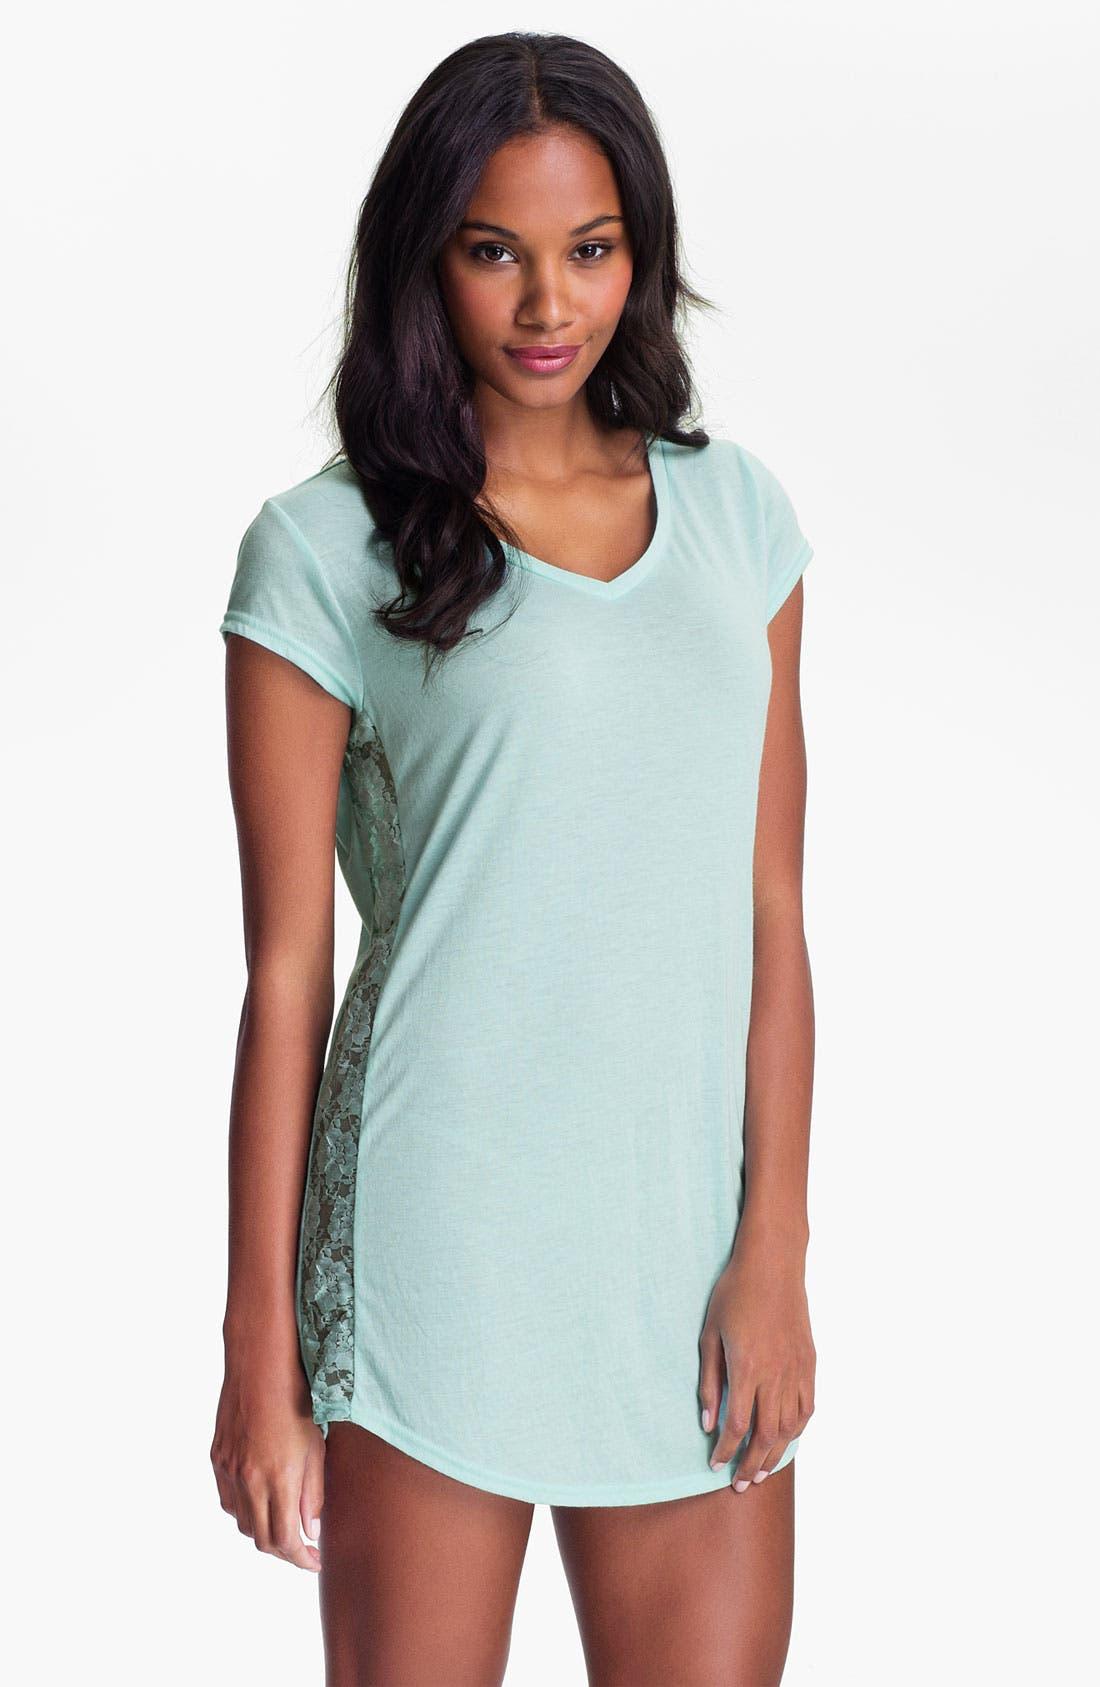 Alternate Image 1 Selected - Make + Model 'By My Side' Sleep Shirt